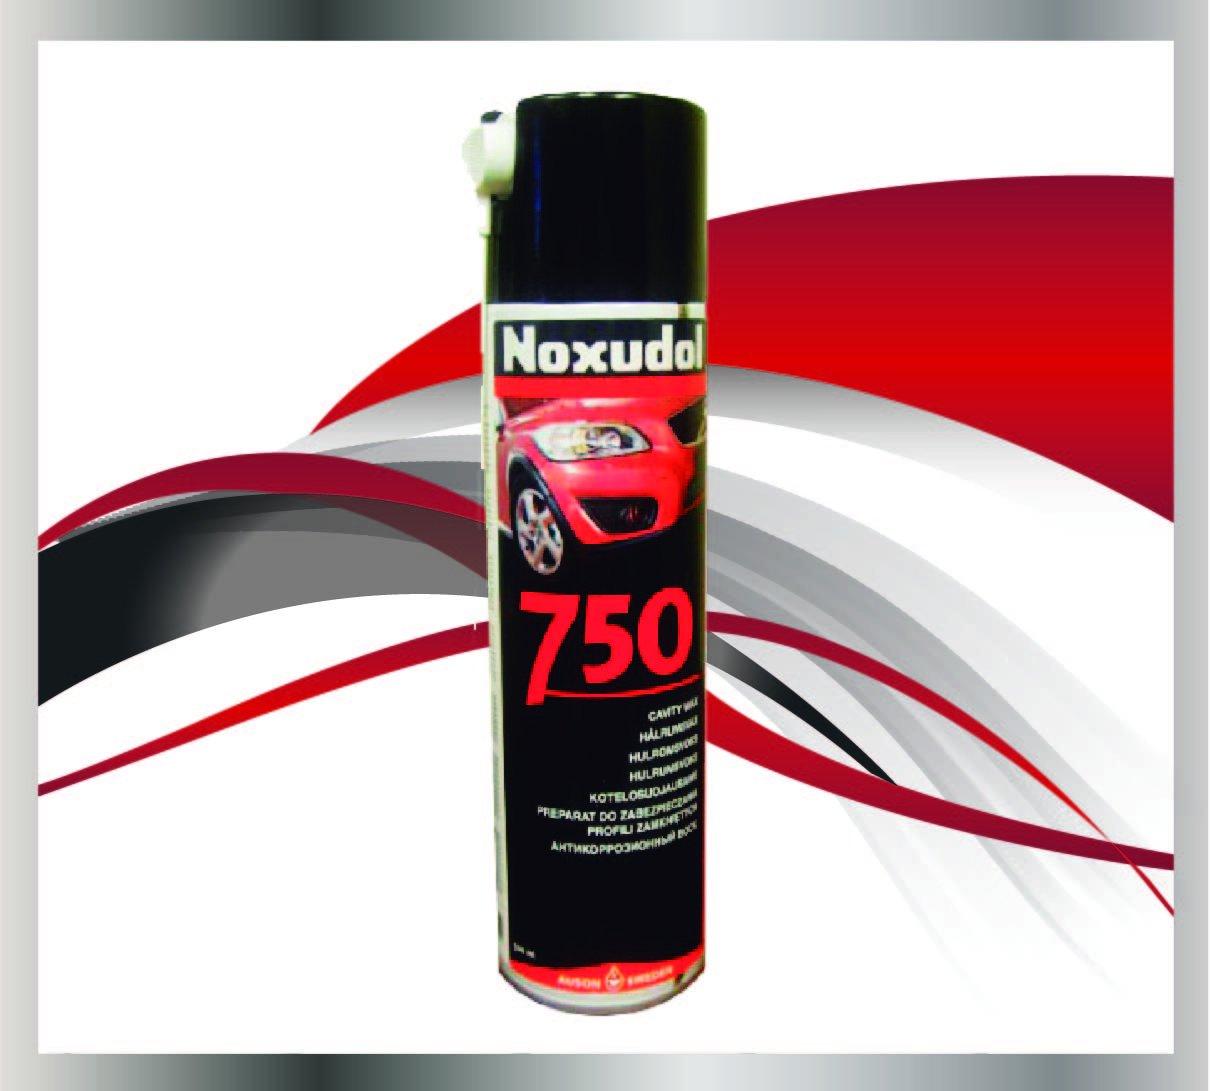 Noxudol 750 - Rusproofing Agent - Cavity Wax Auson N750D